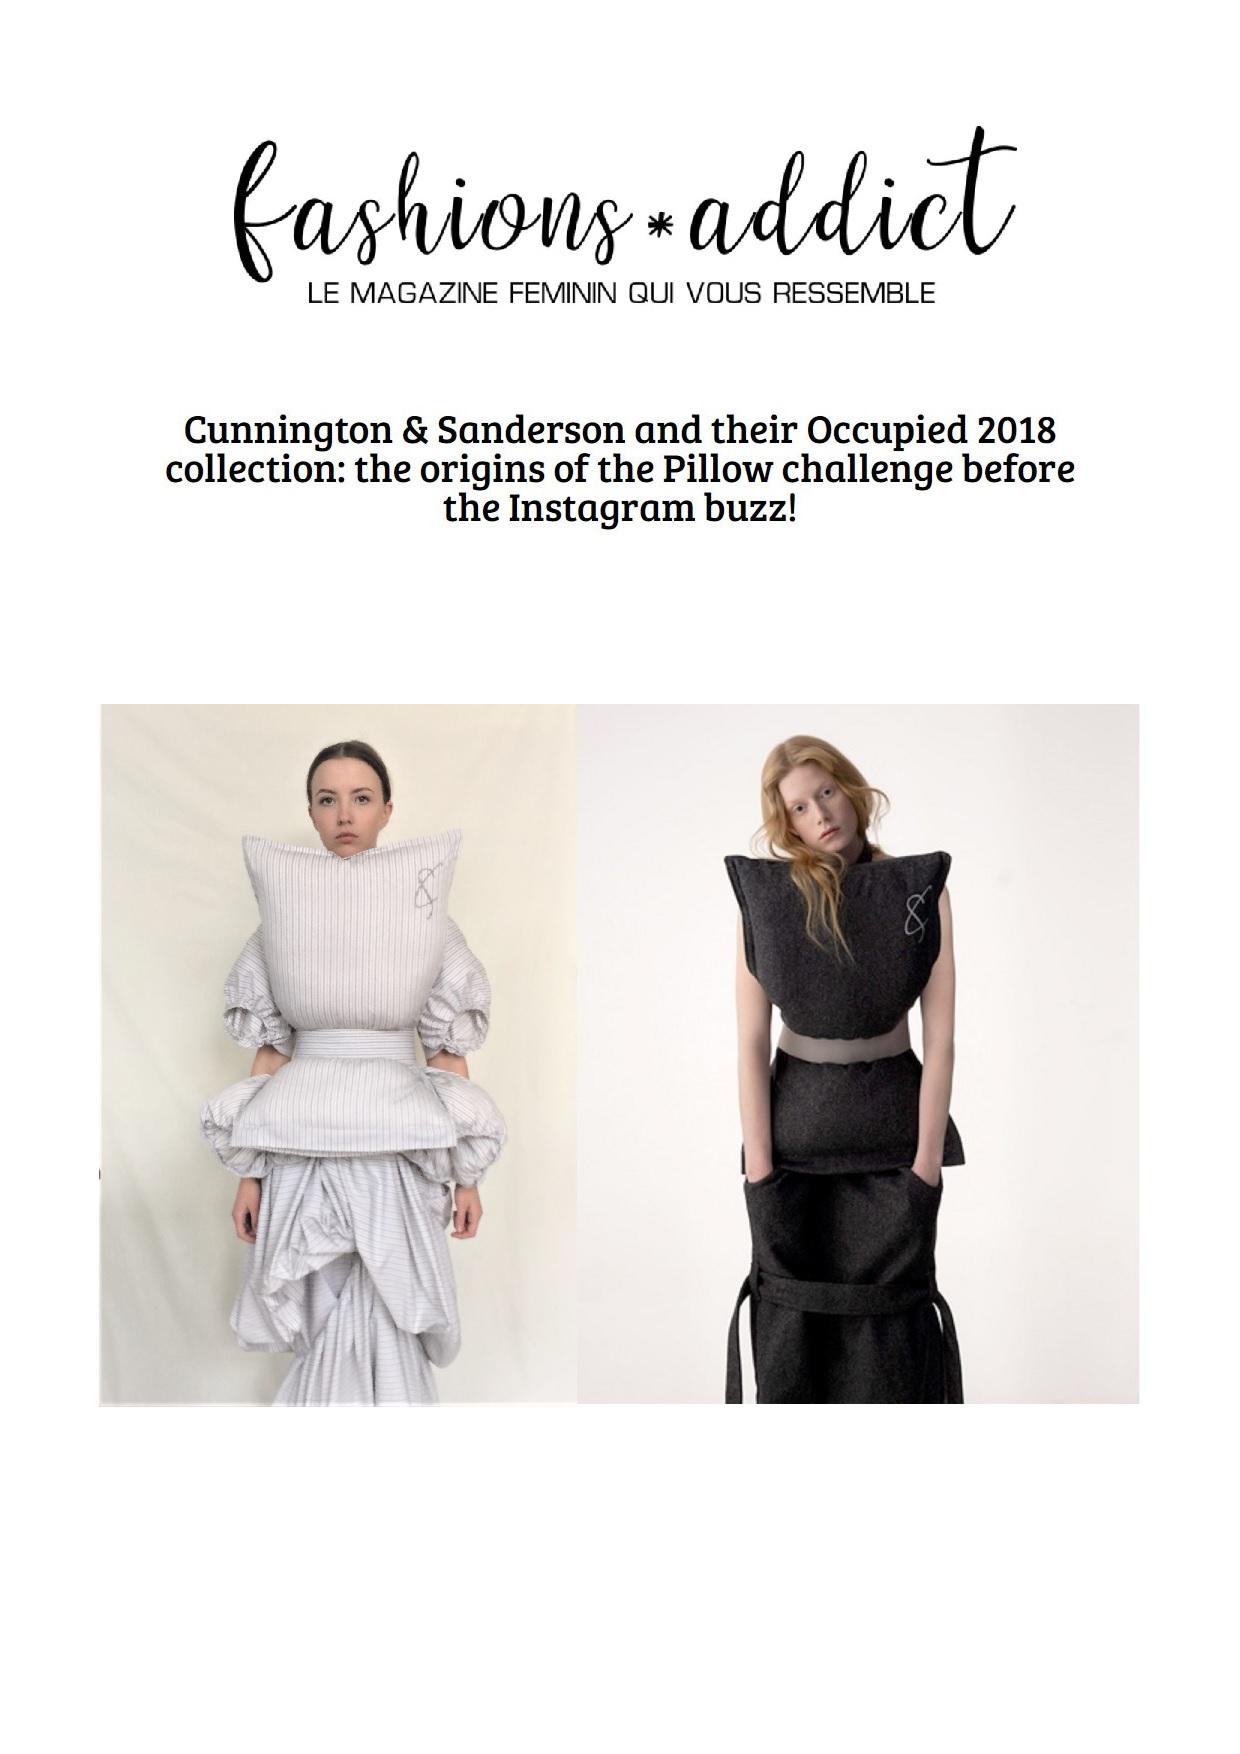 Fashions-addict Pillow Dress Origins